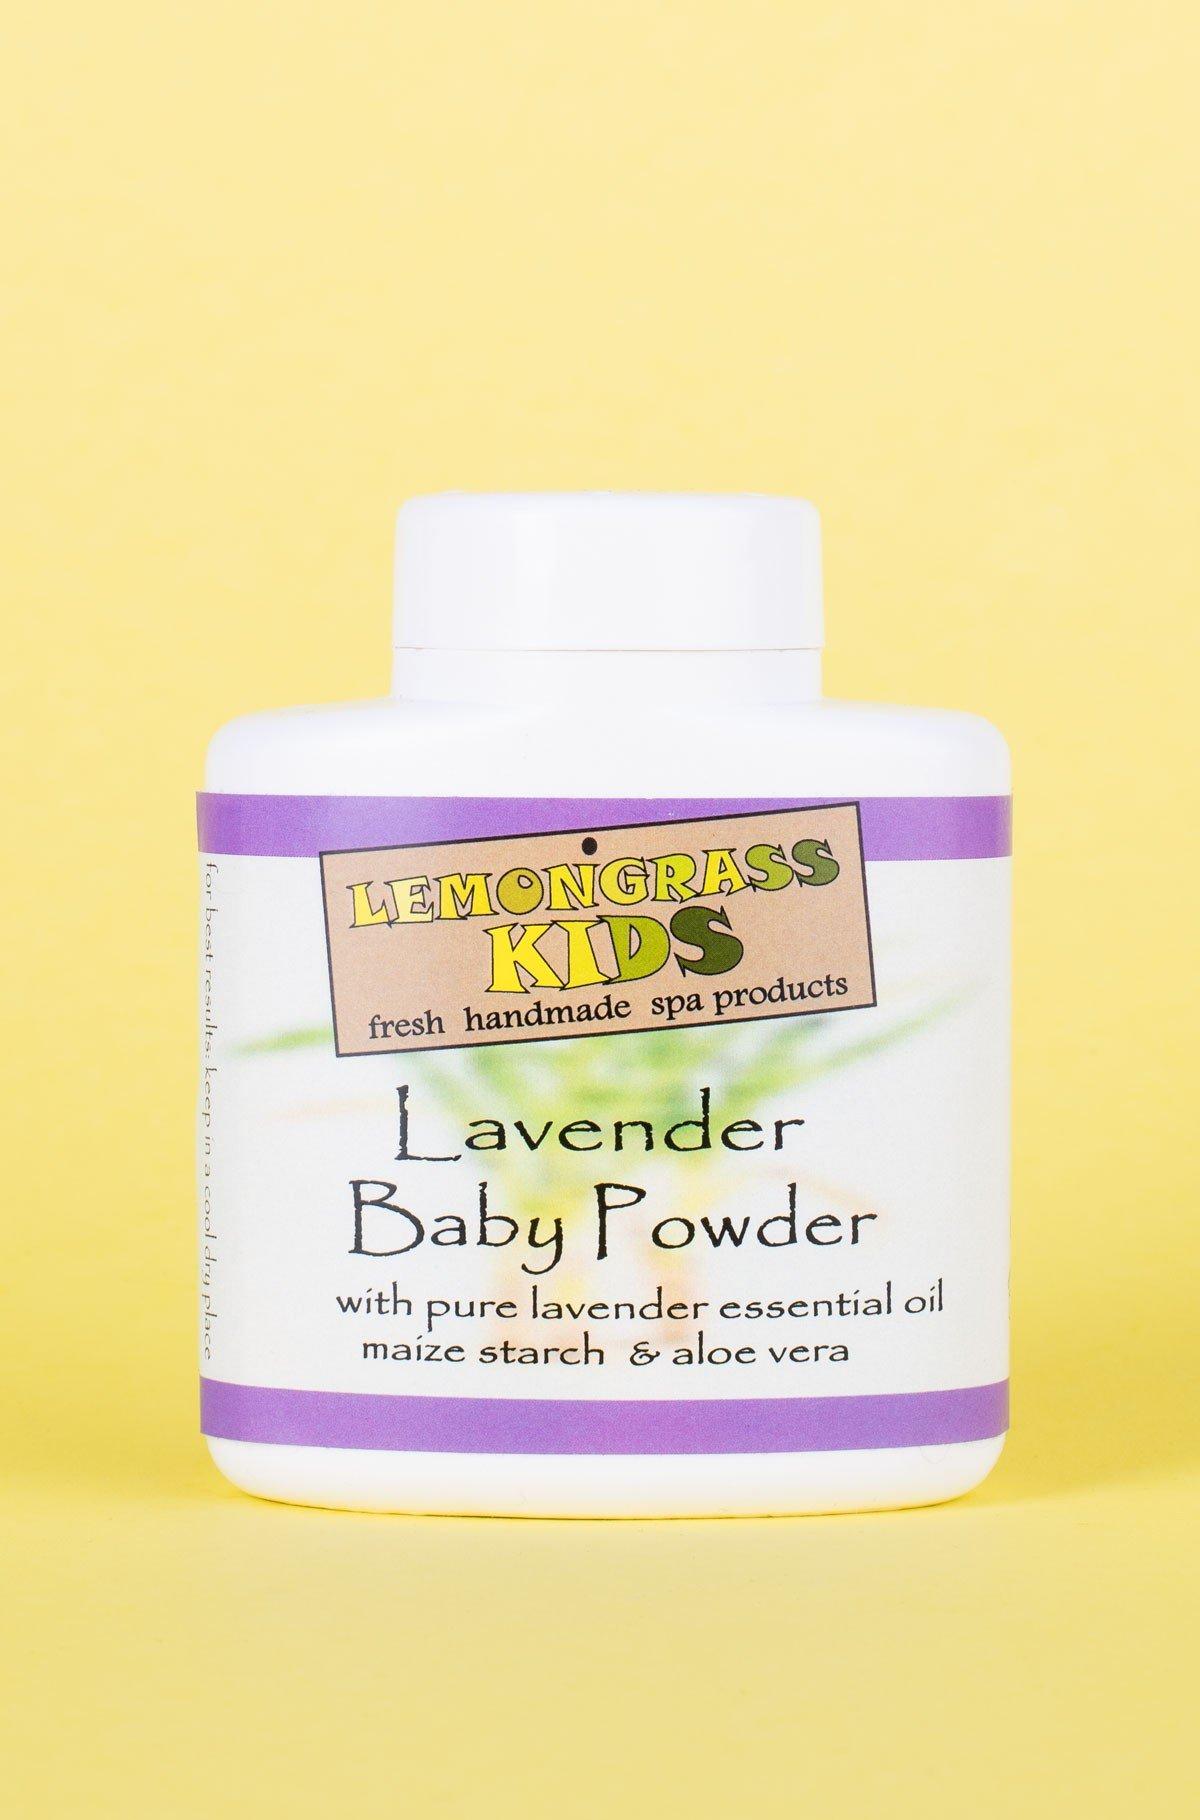 Beebipuuder BABY POWDER LAVENDER 100G-full-1